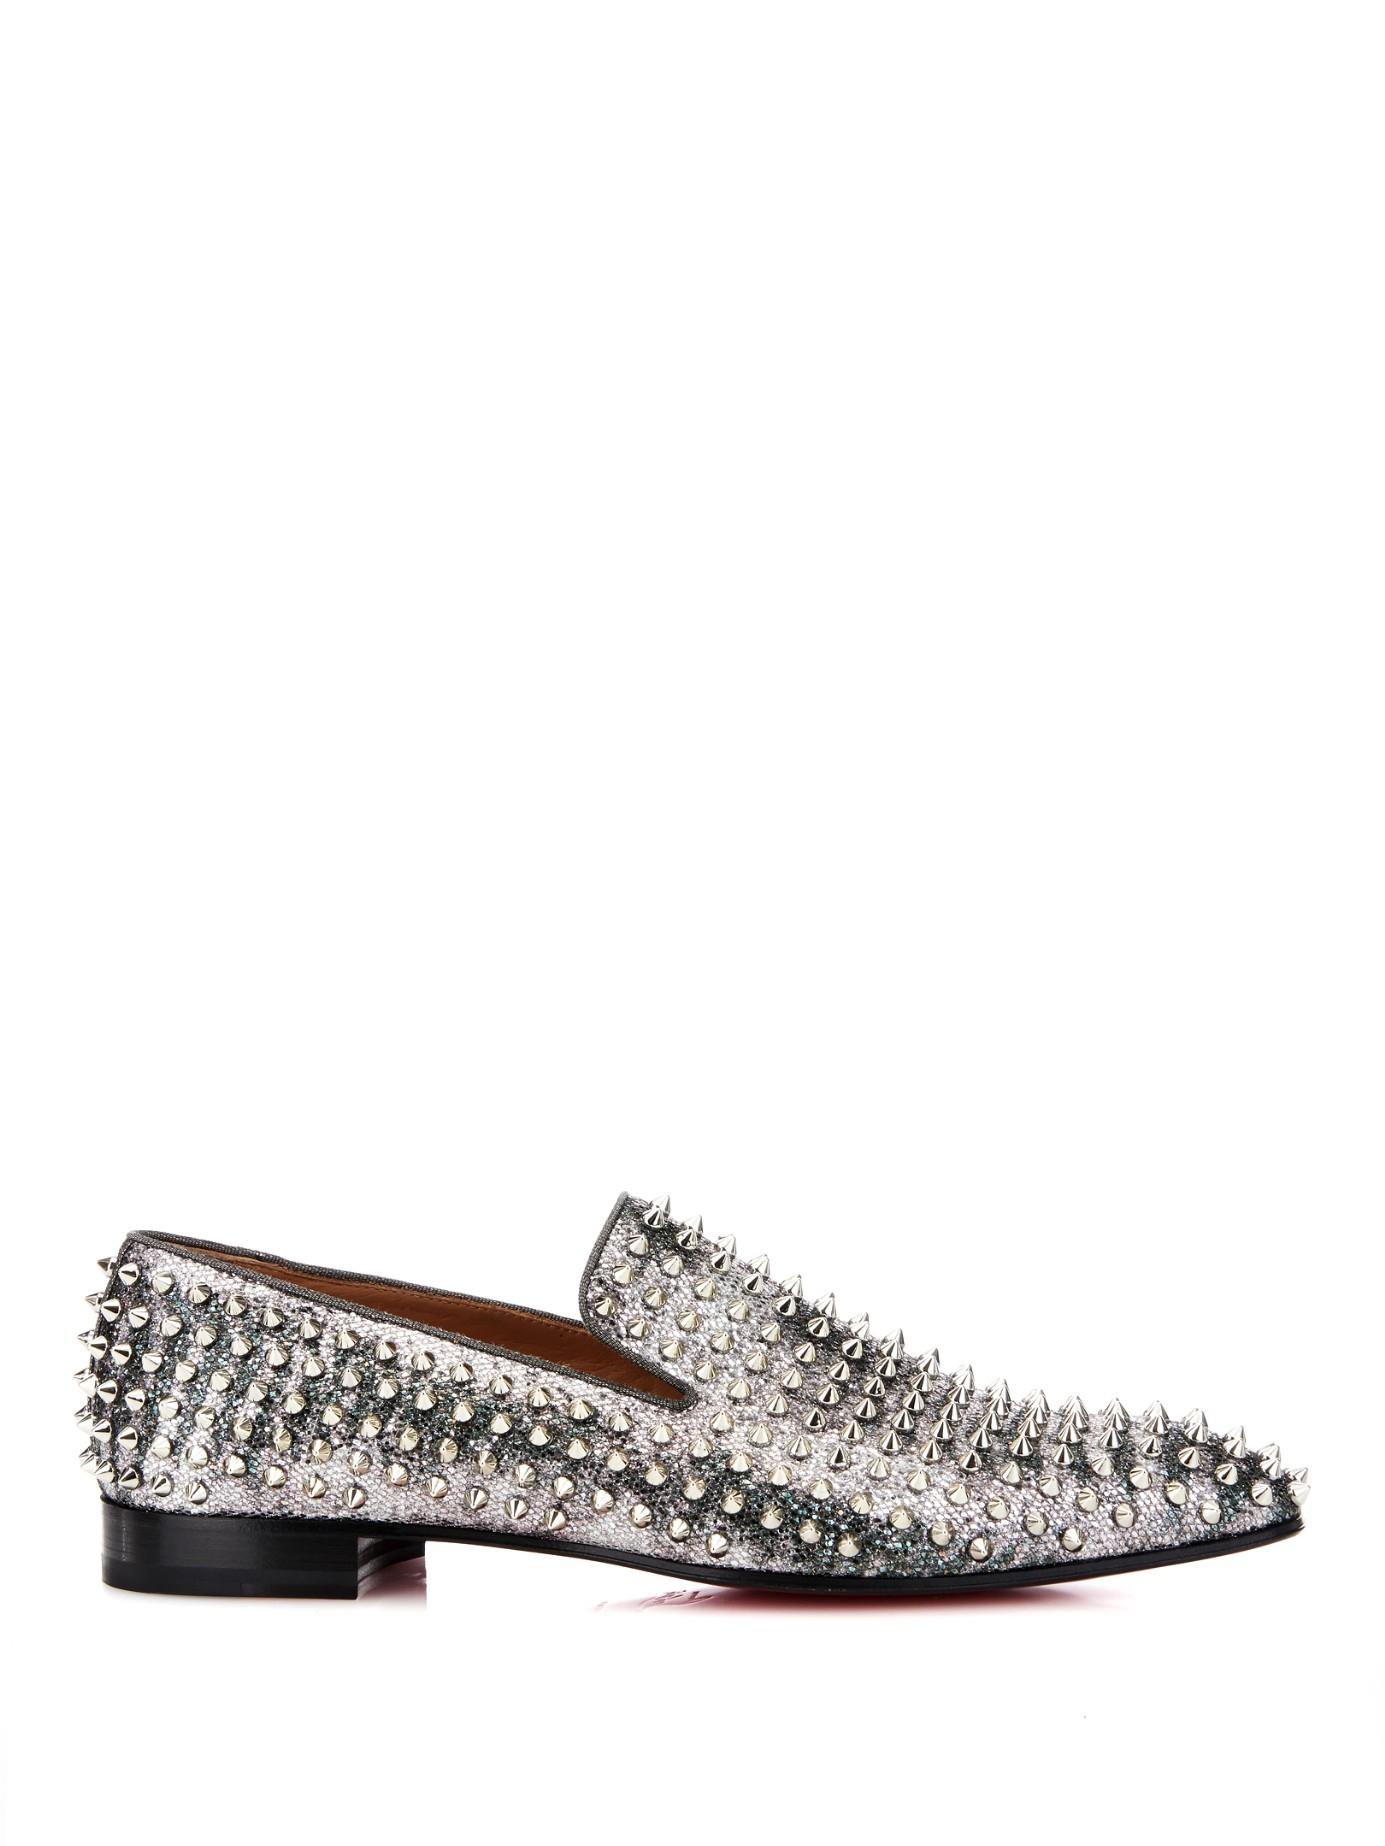 christian louboutin men loafers - Christian louboutin Dandelion Studded Glitter Loafers in Silver ...